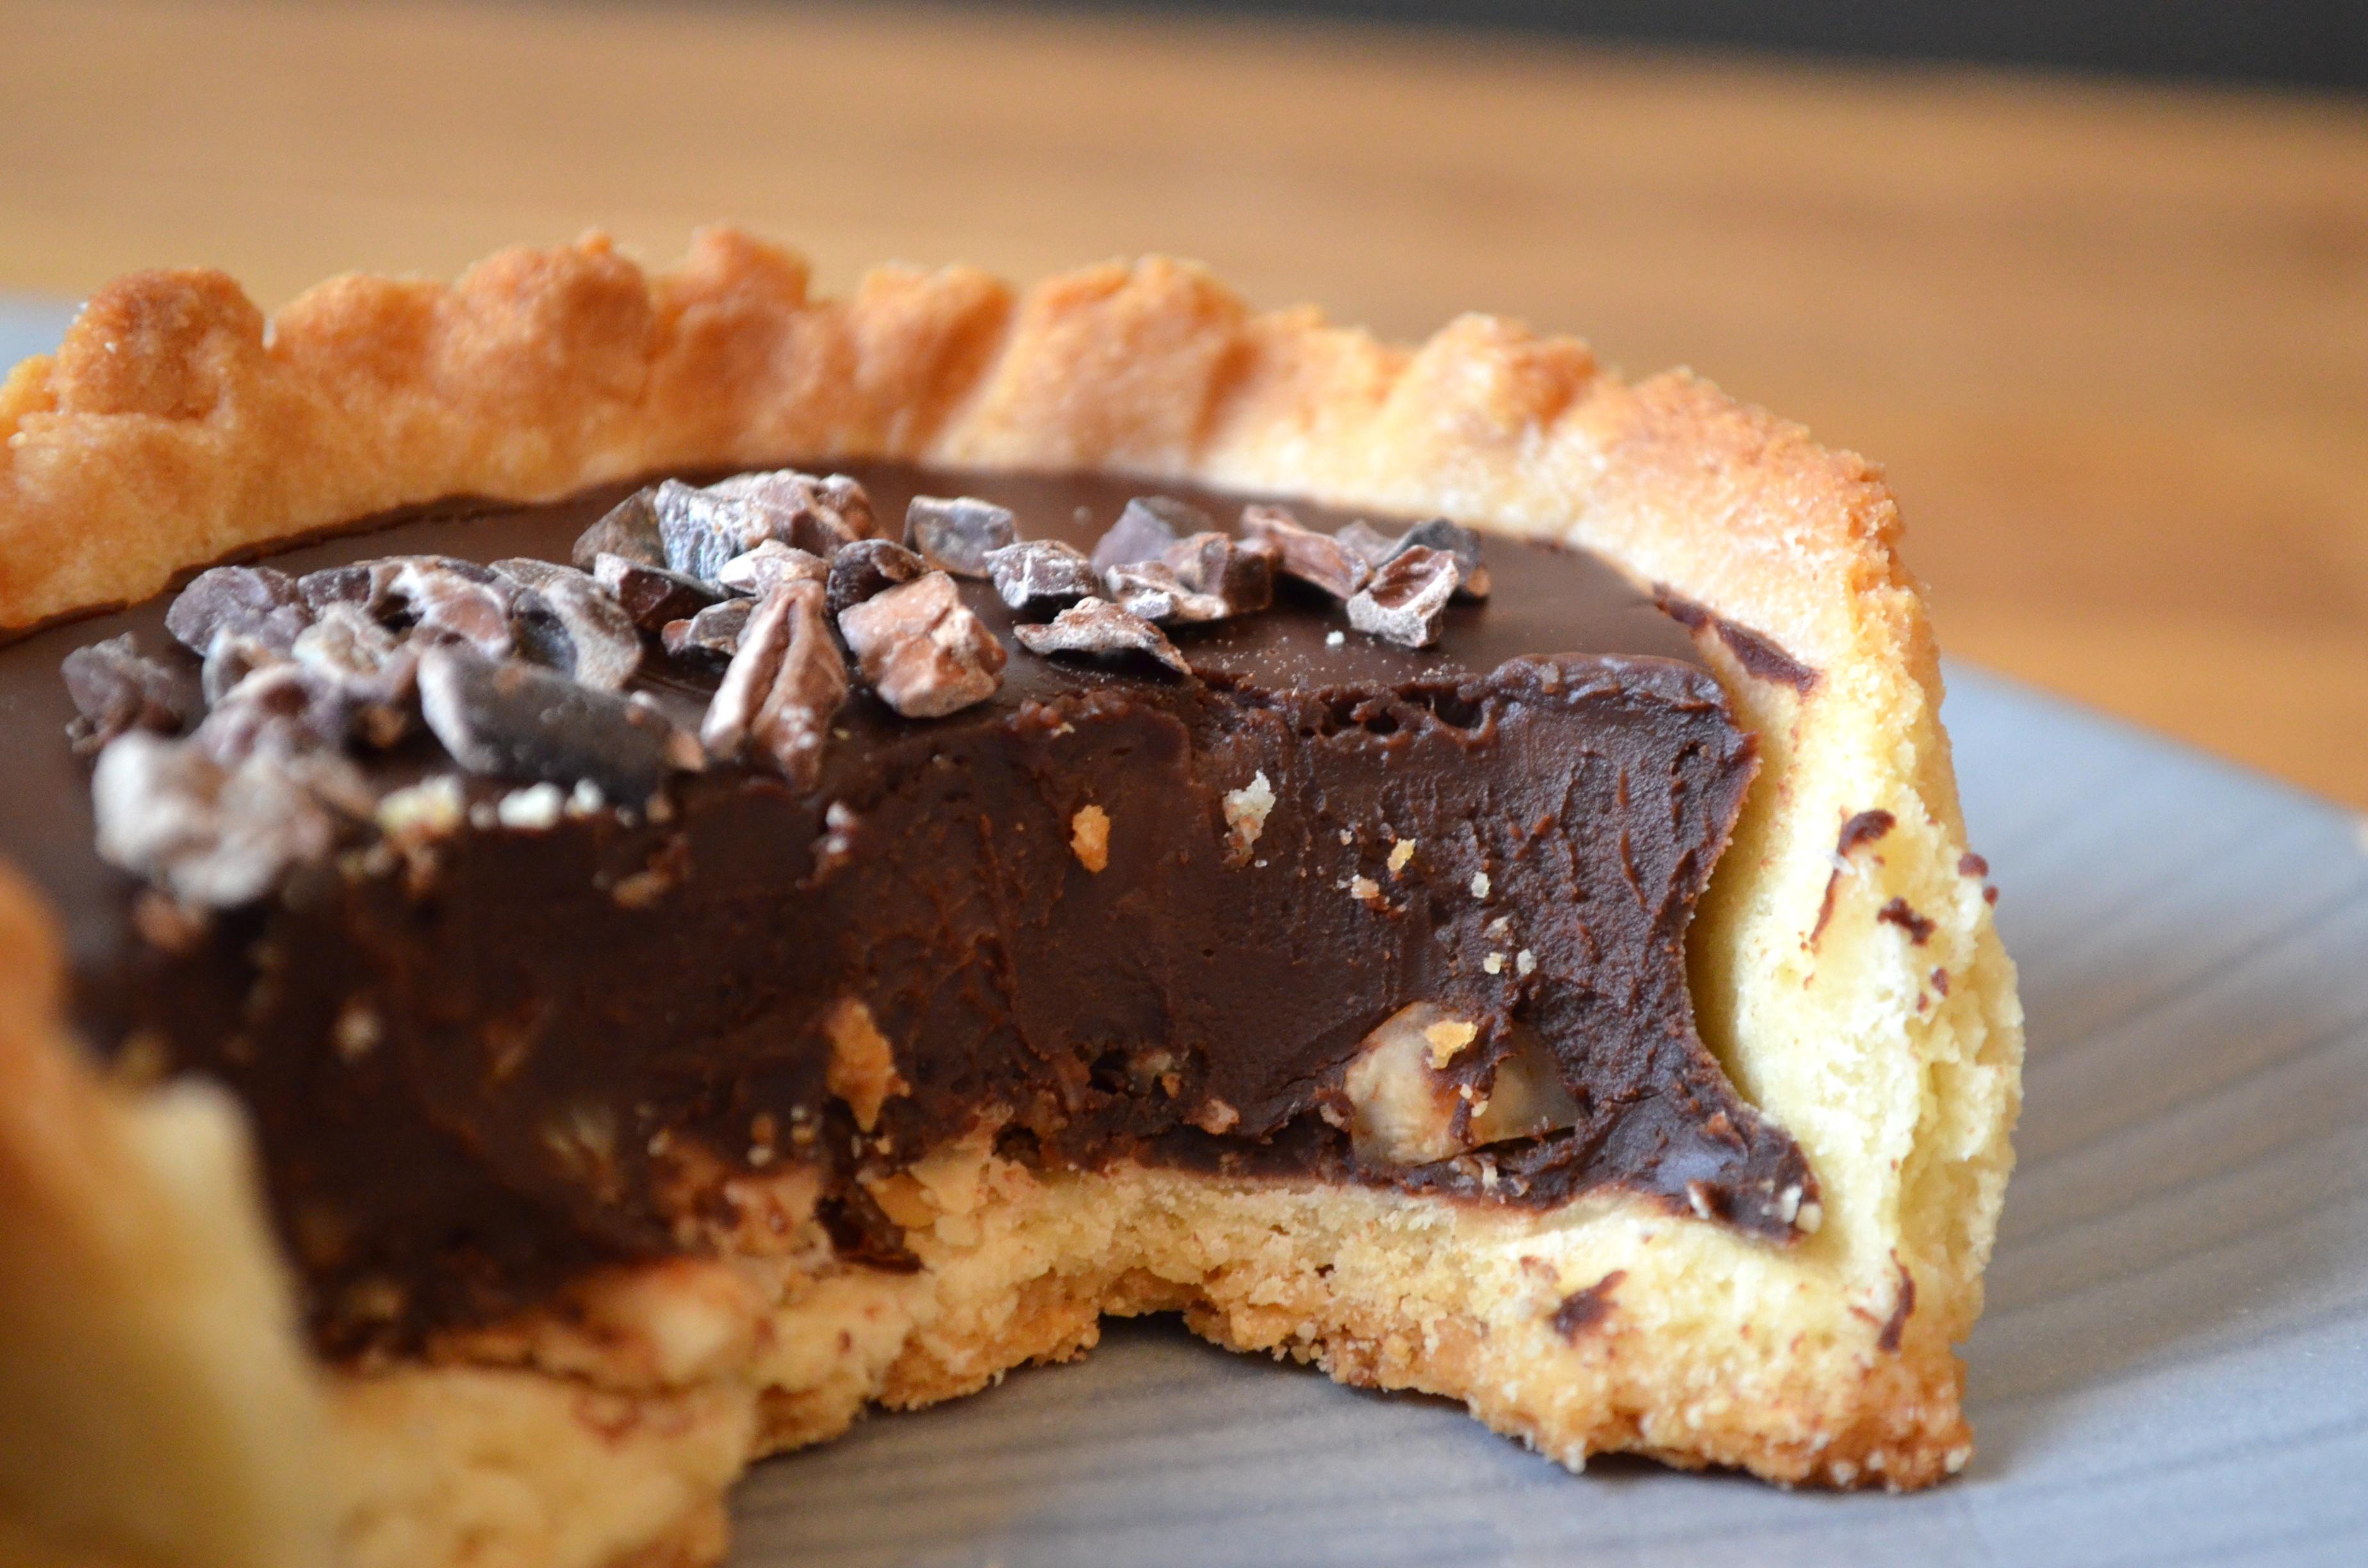 Tarte au chocolat, noisettes & caramel au beurre salé / Chocolate, hazelnut & salted caramel tart